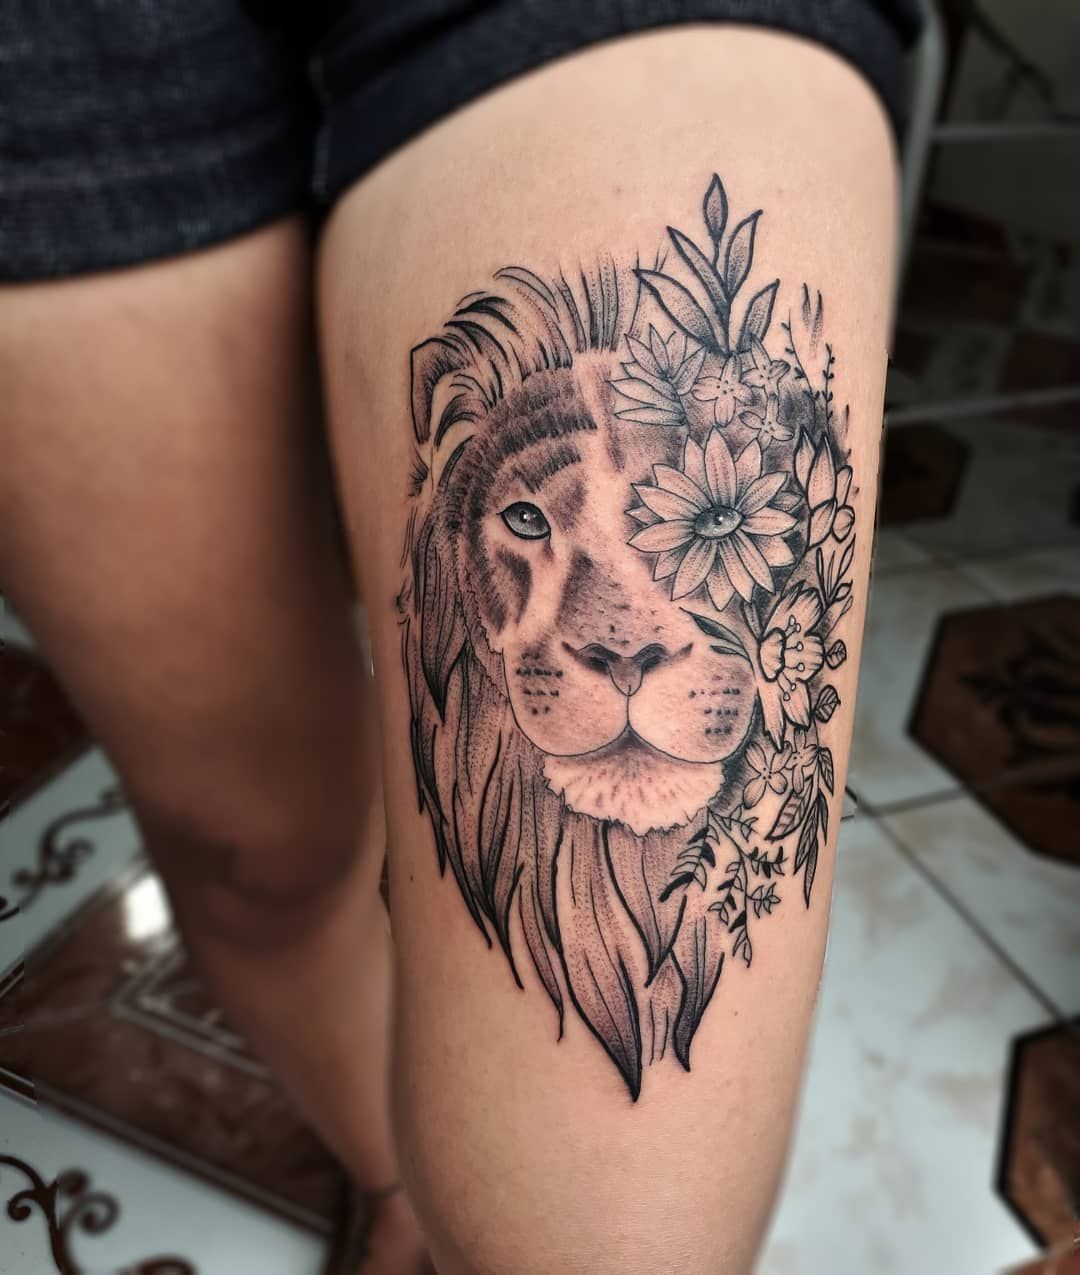 Awesome Lion Tattoo Ideas C Tattoo Artist Felipe Dalio Awesomelionphotos Foot Tattoos Tattoos For Women Girly Tattoos